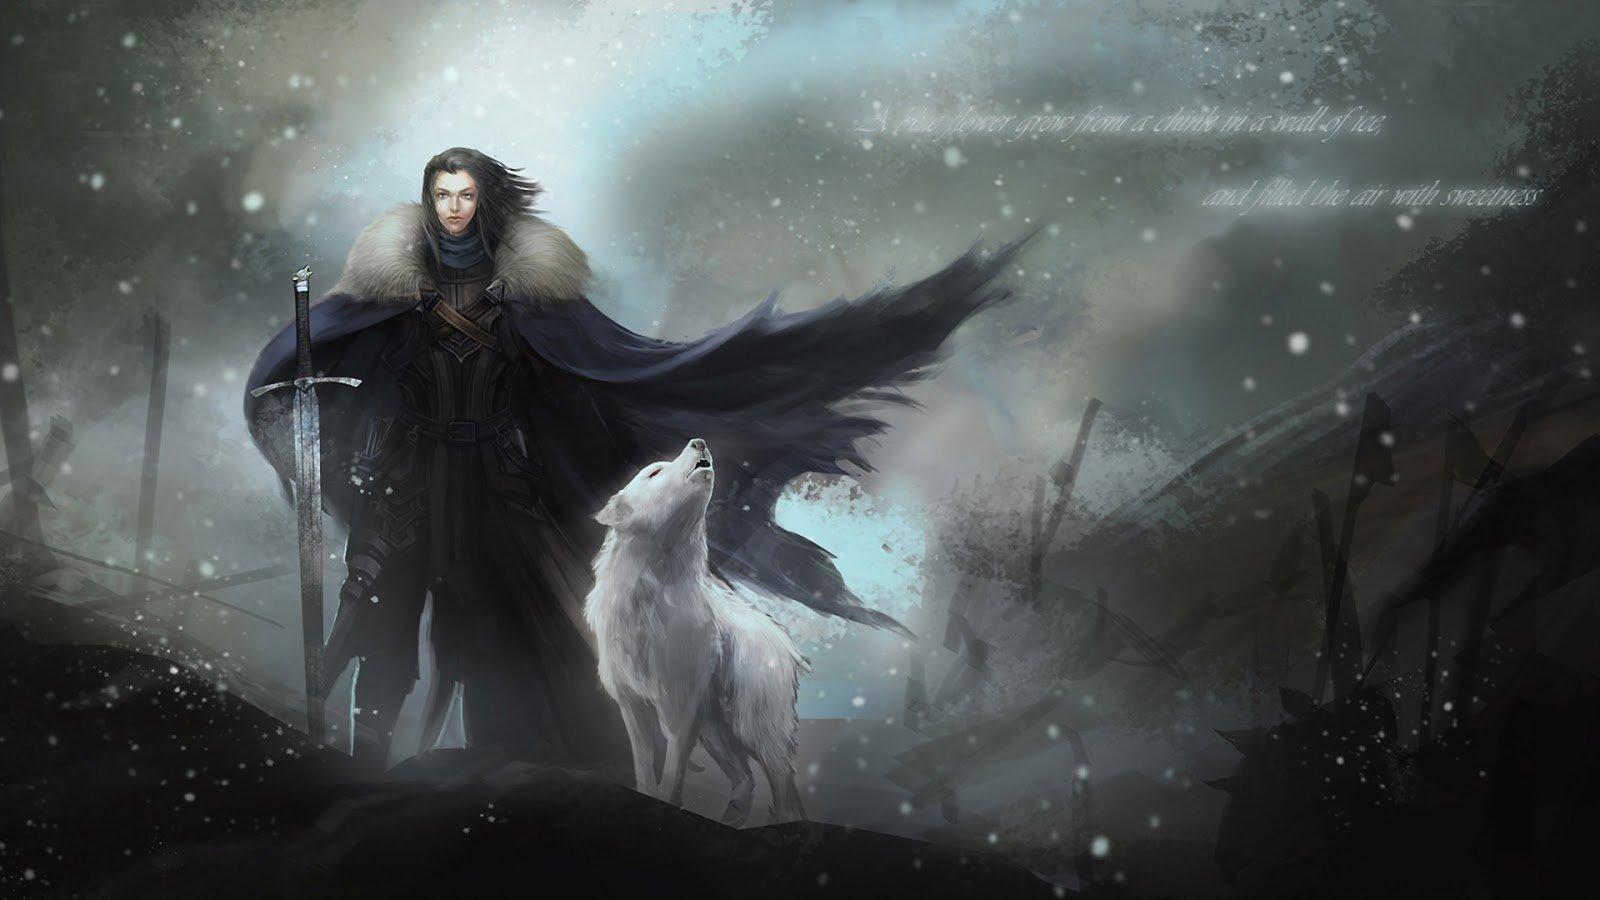 Jon Snow Wallpaper HD